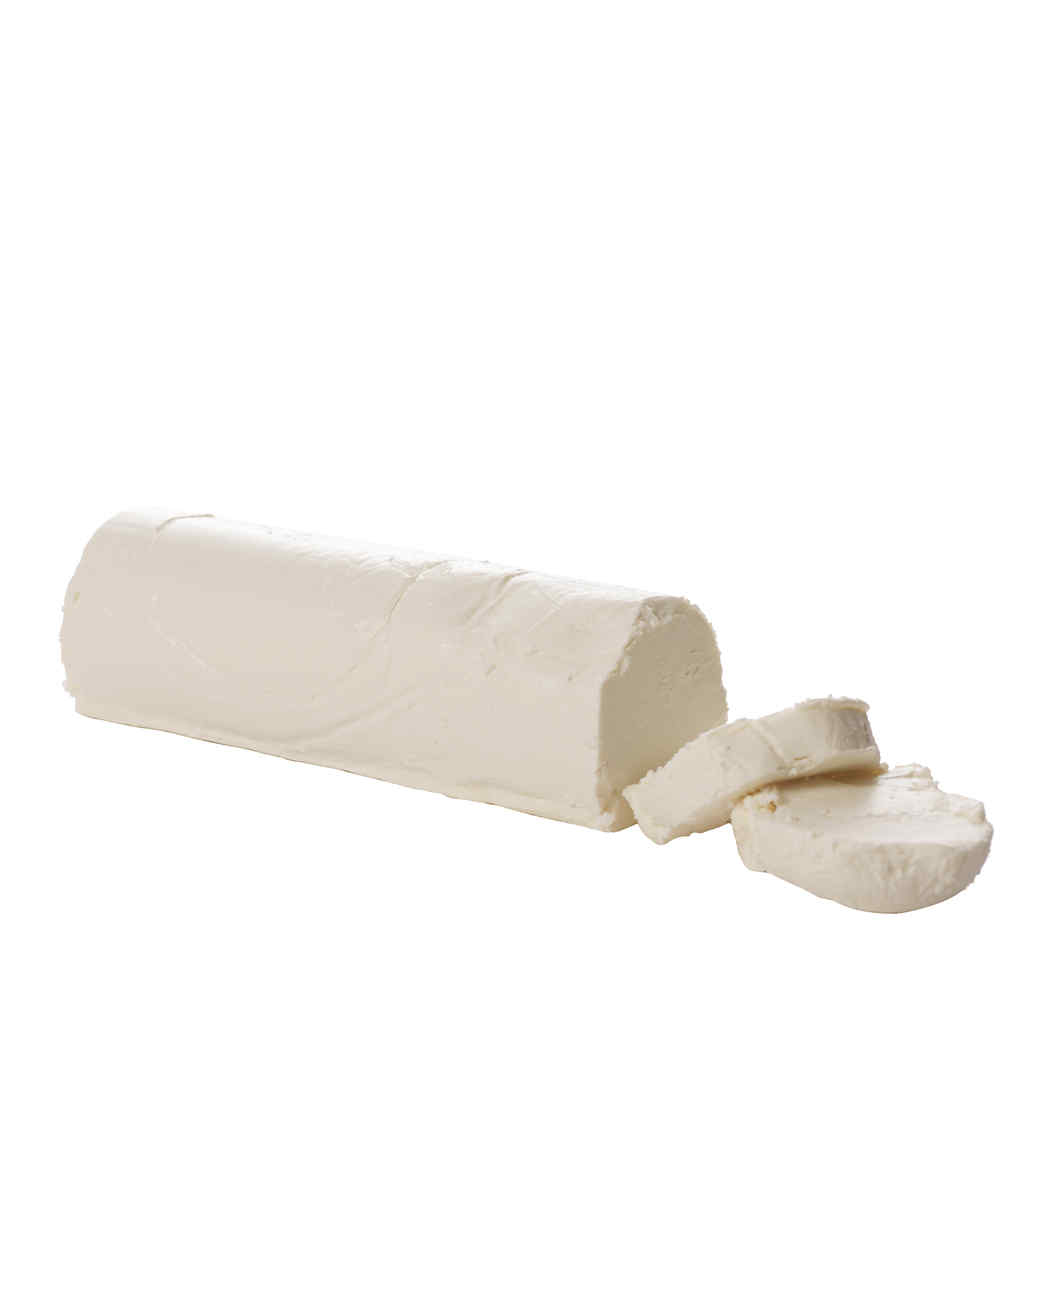 goat-cheese-020-d111263.jpg